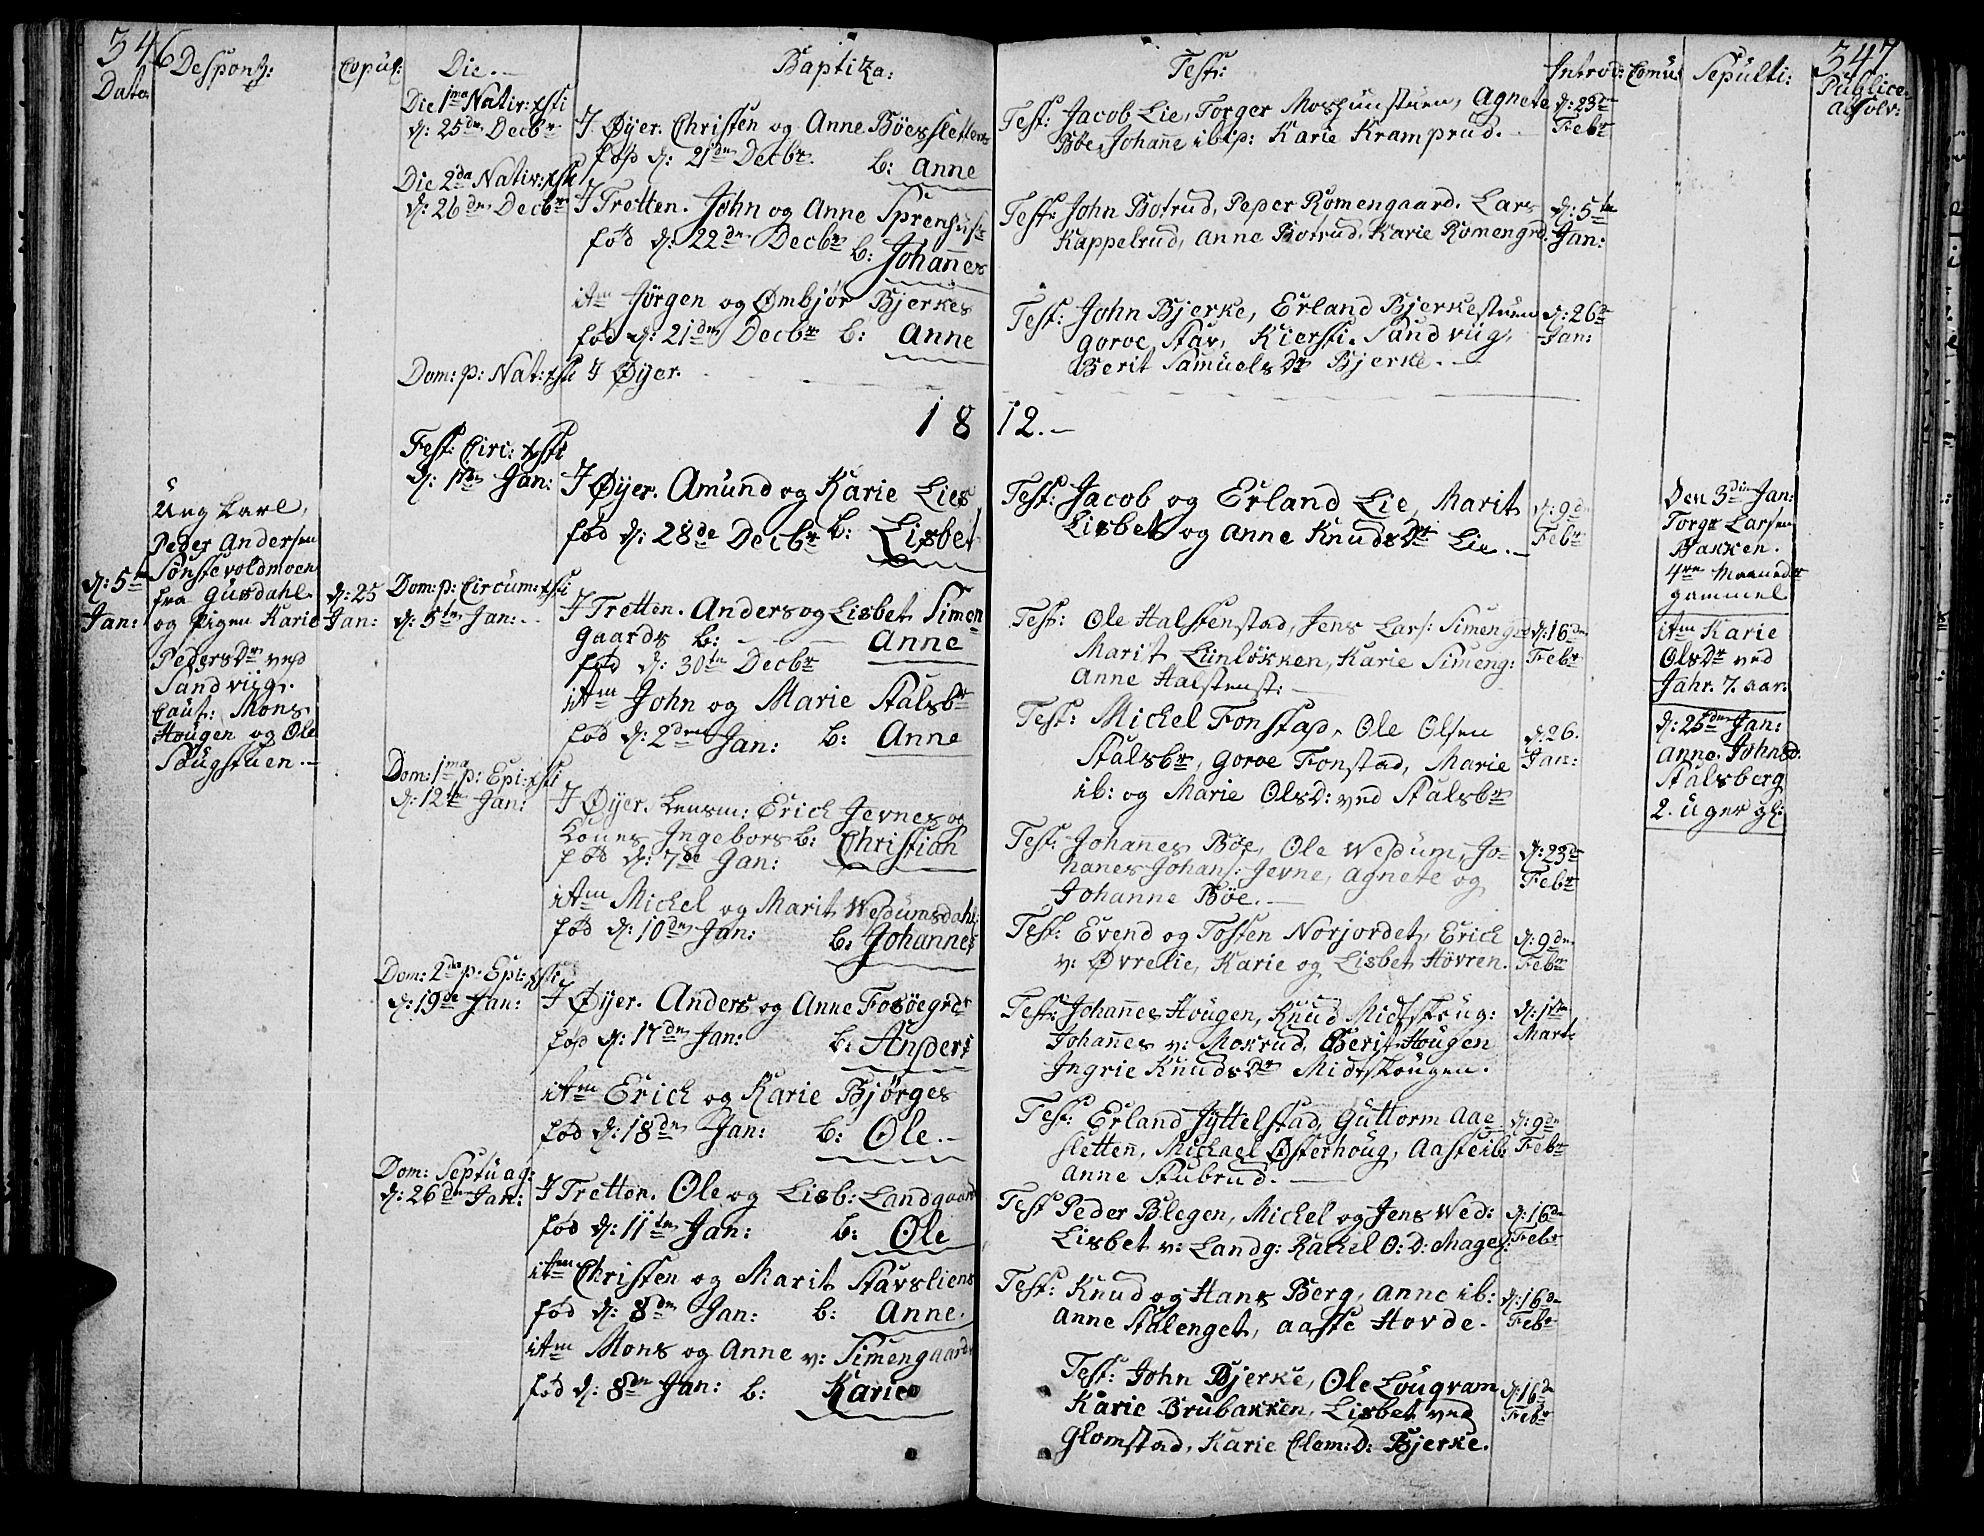 SAH, Øyer prestekontor, Ministerialbok nr. 3, 1784-1824, s. 346-347